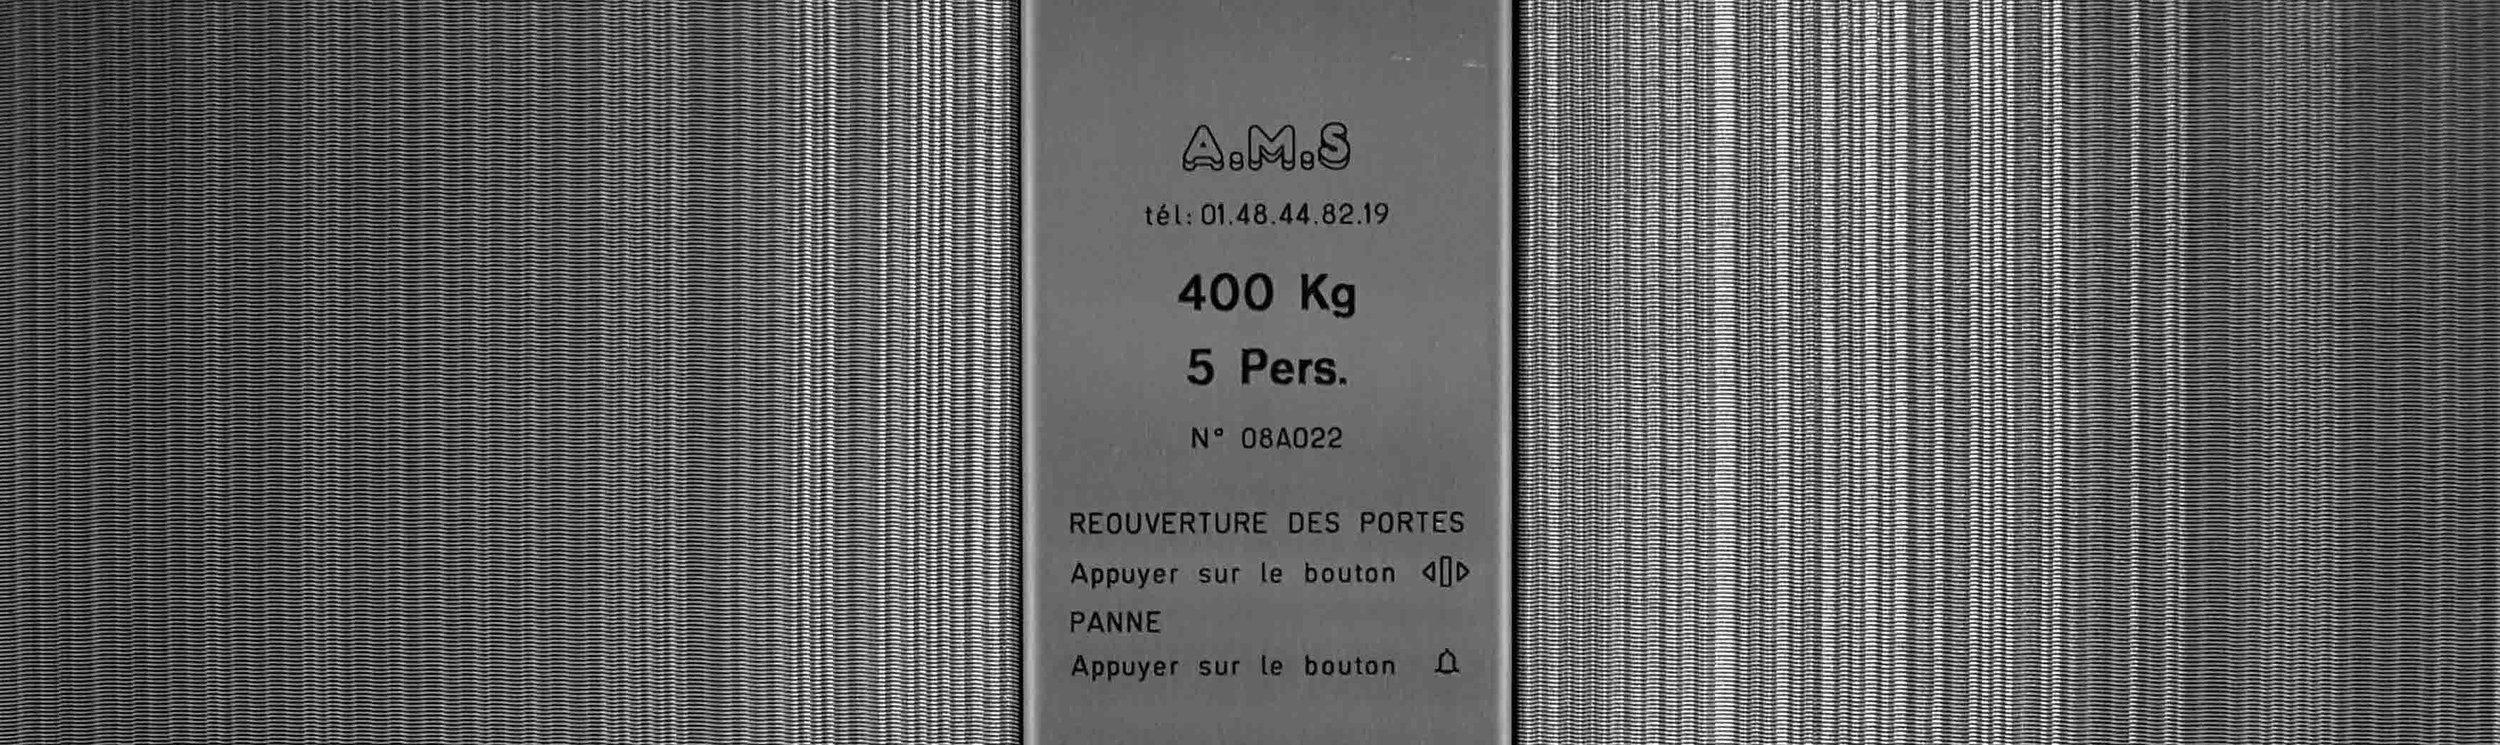 PARIS_PRIVATE_ELEVATOR_2 copy.jpg